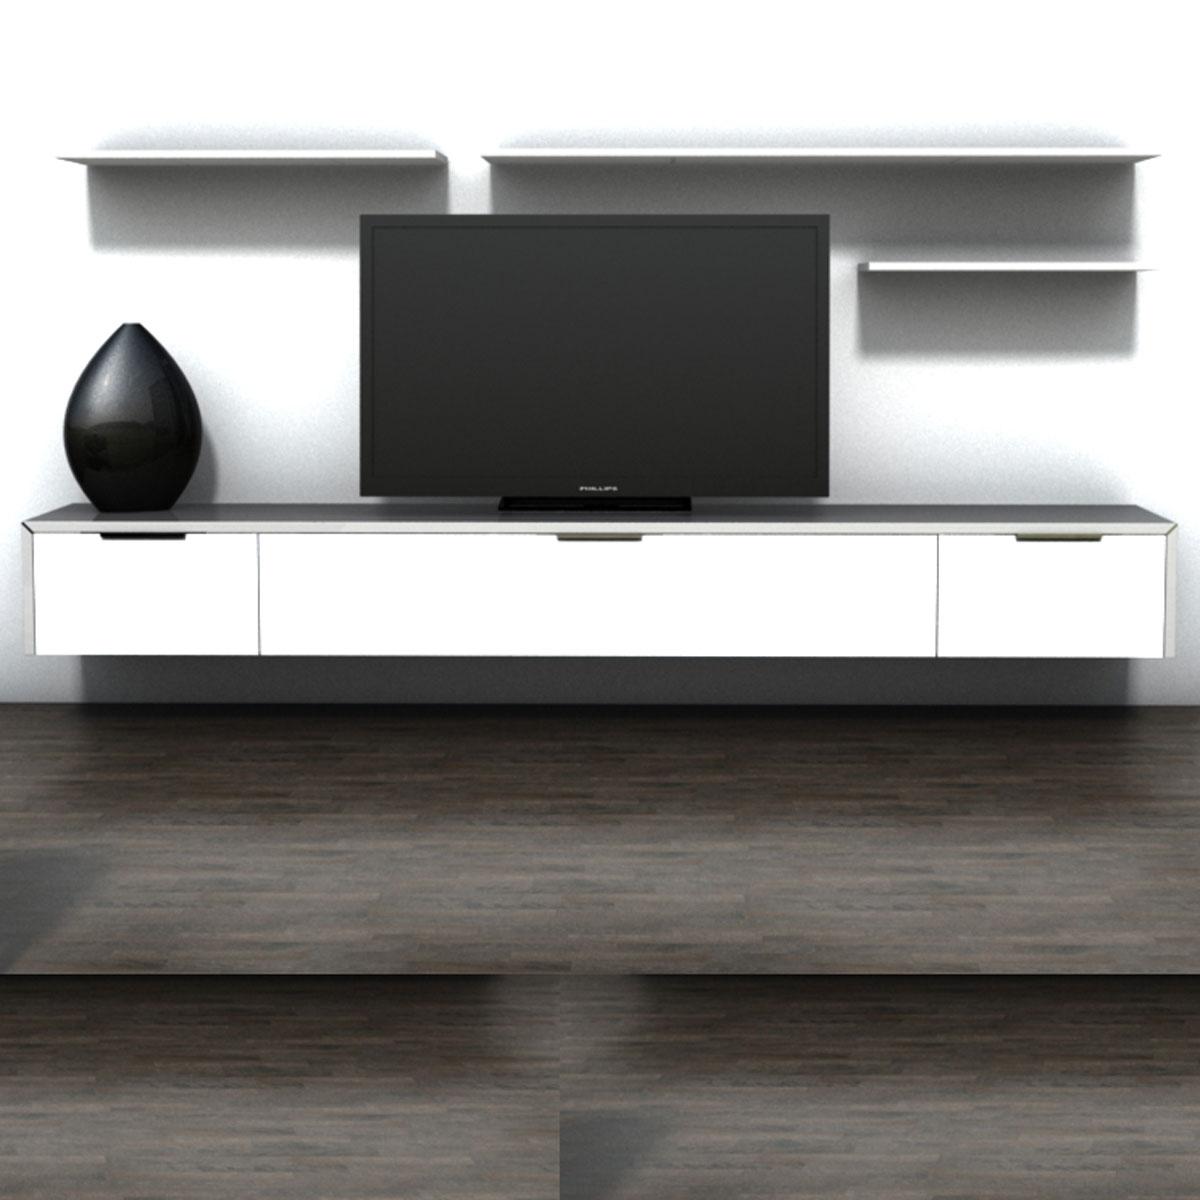 Hifi möbel wandmontage  Schnepel S1 LB Sound, LB-1 Sound, LB-2 / Lowboard bei hifi-tv ...